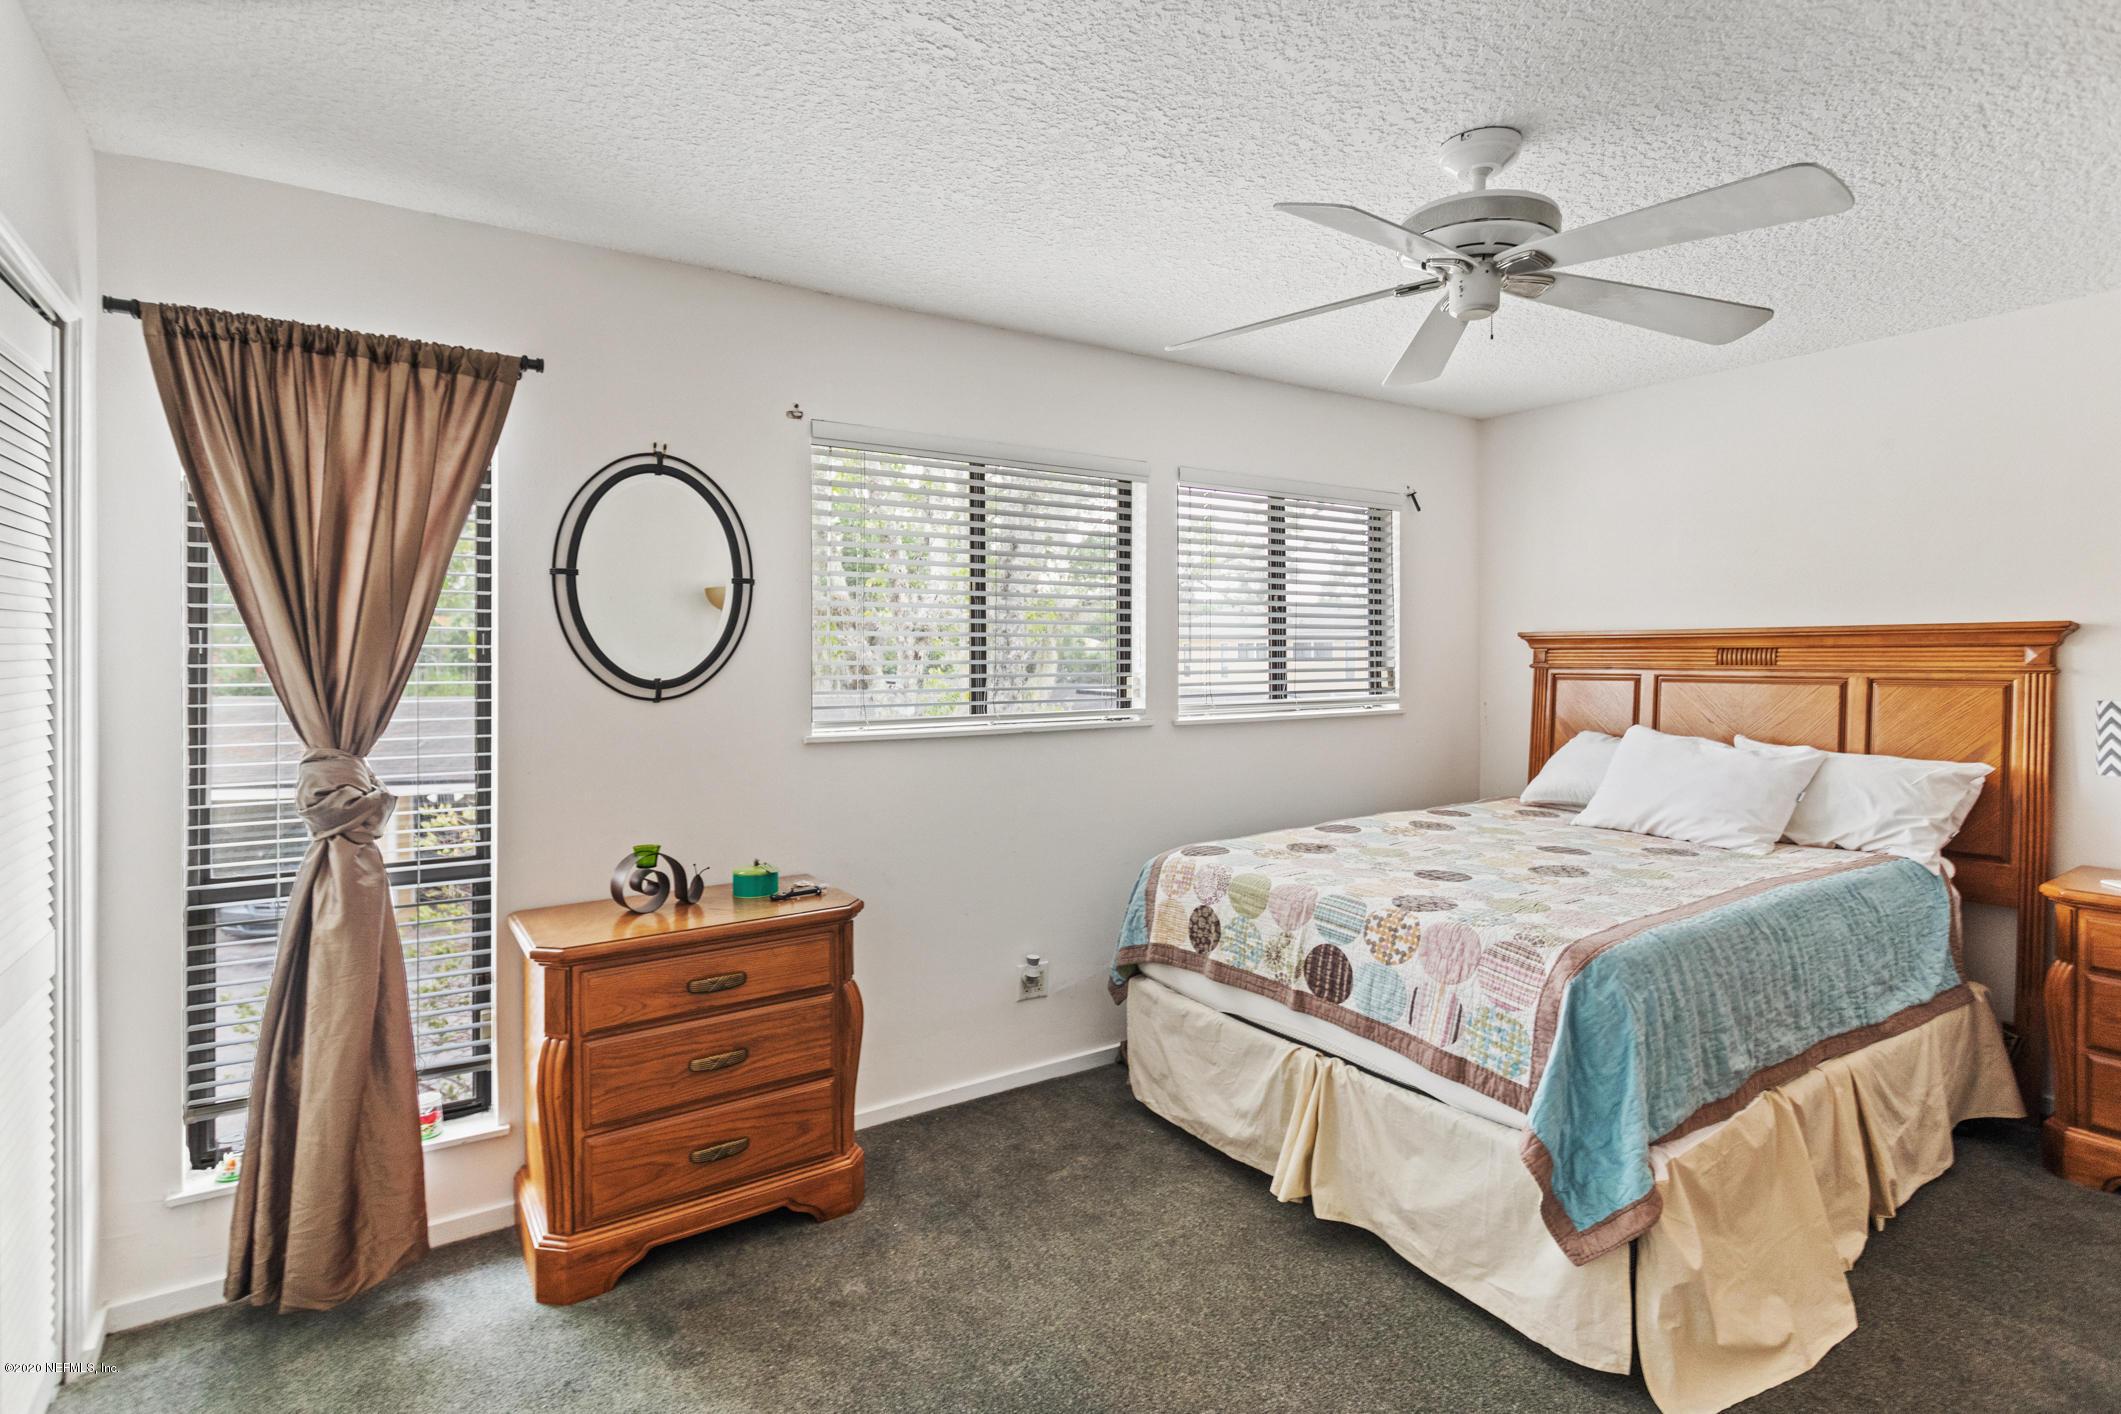 7893 BAHIA VISTA, JACKSONVILLE, FLORIDA 32256, 4 Bedrooms Bedrooms, ,3 BathroomsBathrooms,Residential,For sale,BAHIA VISTA,1069297